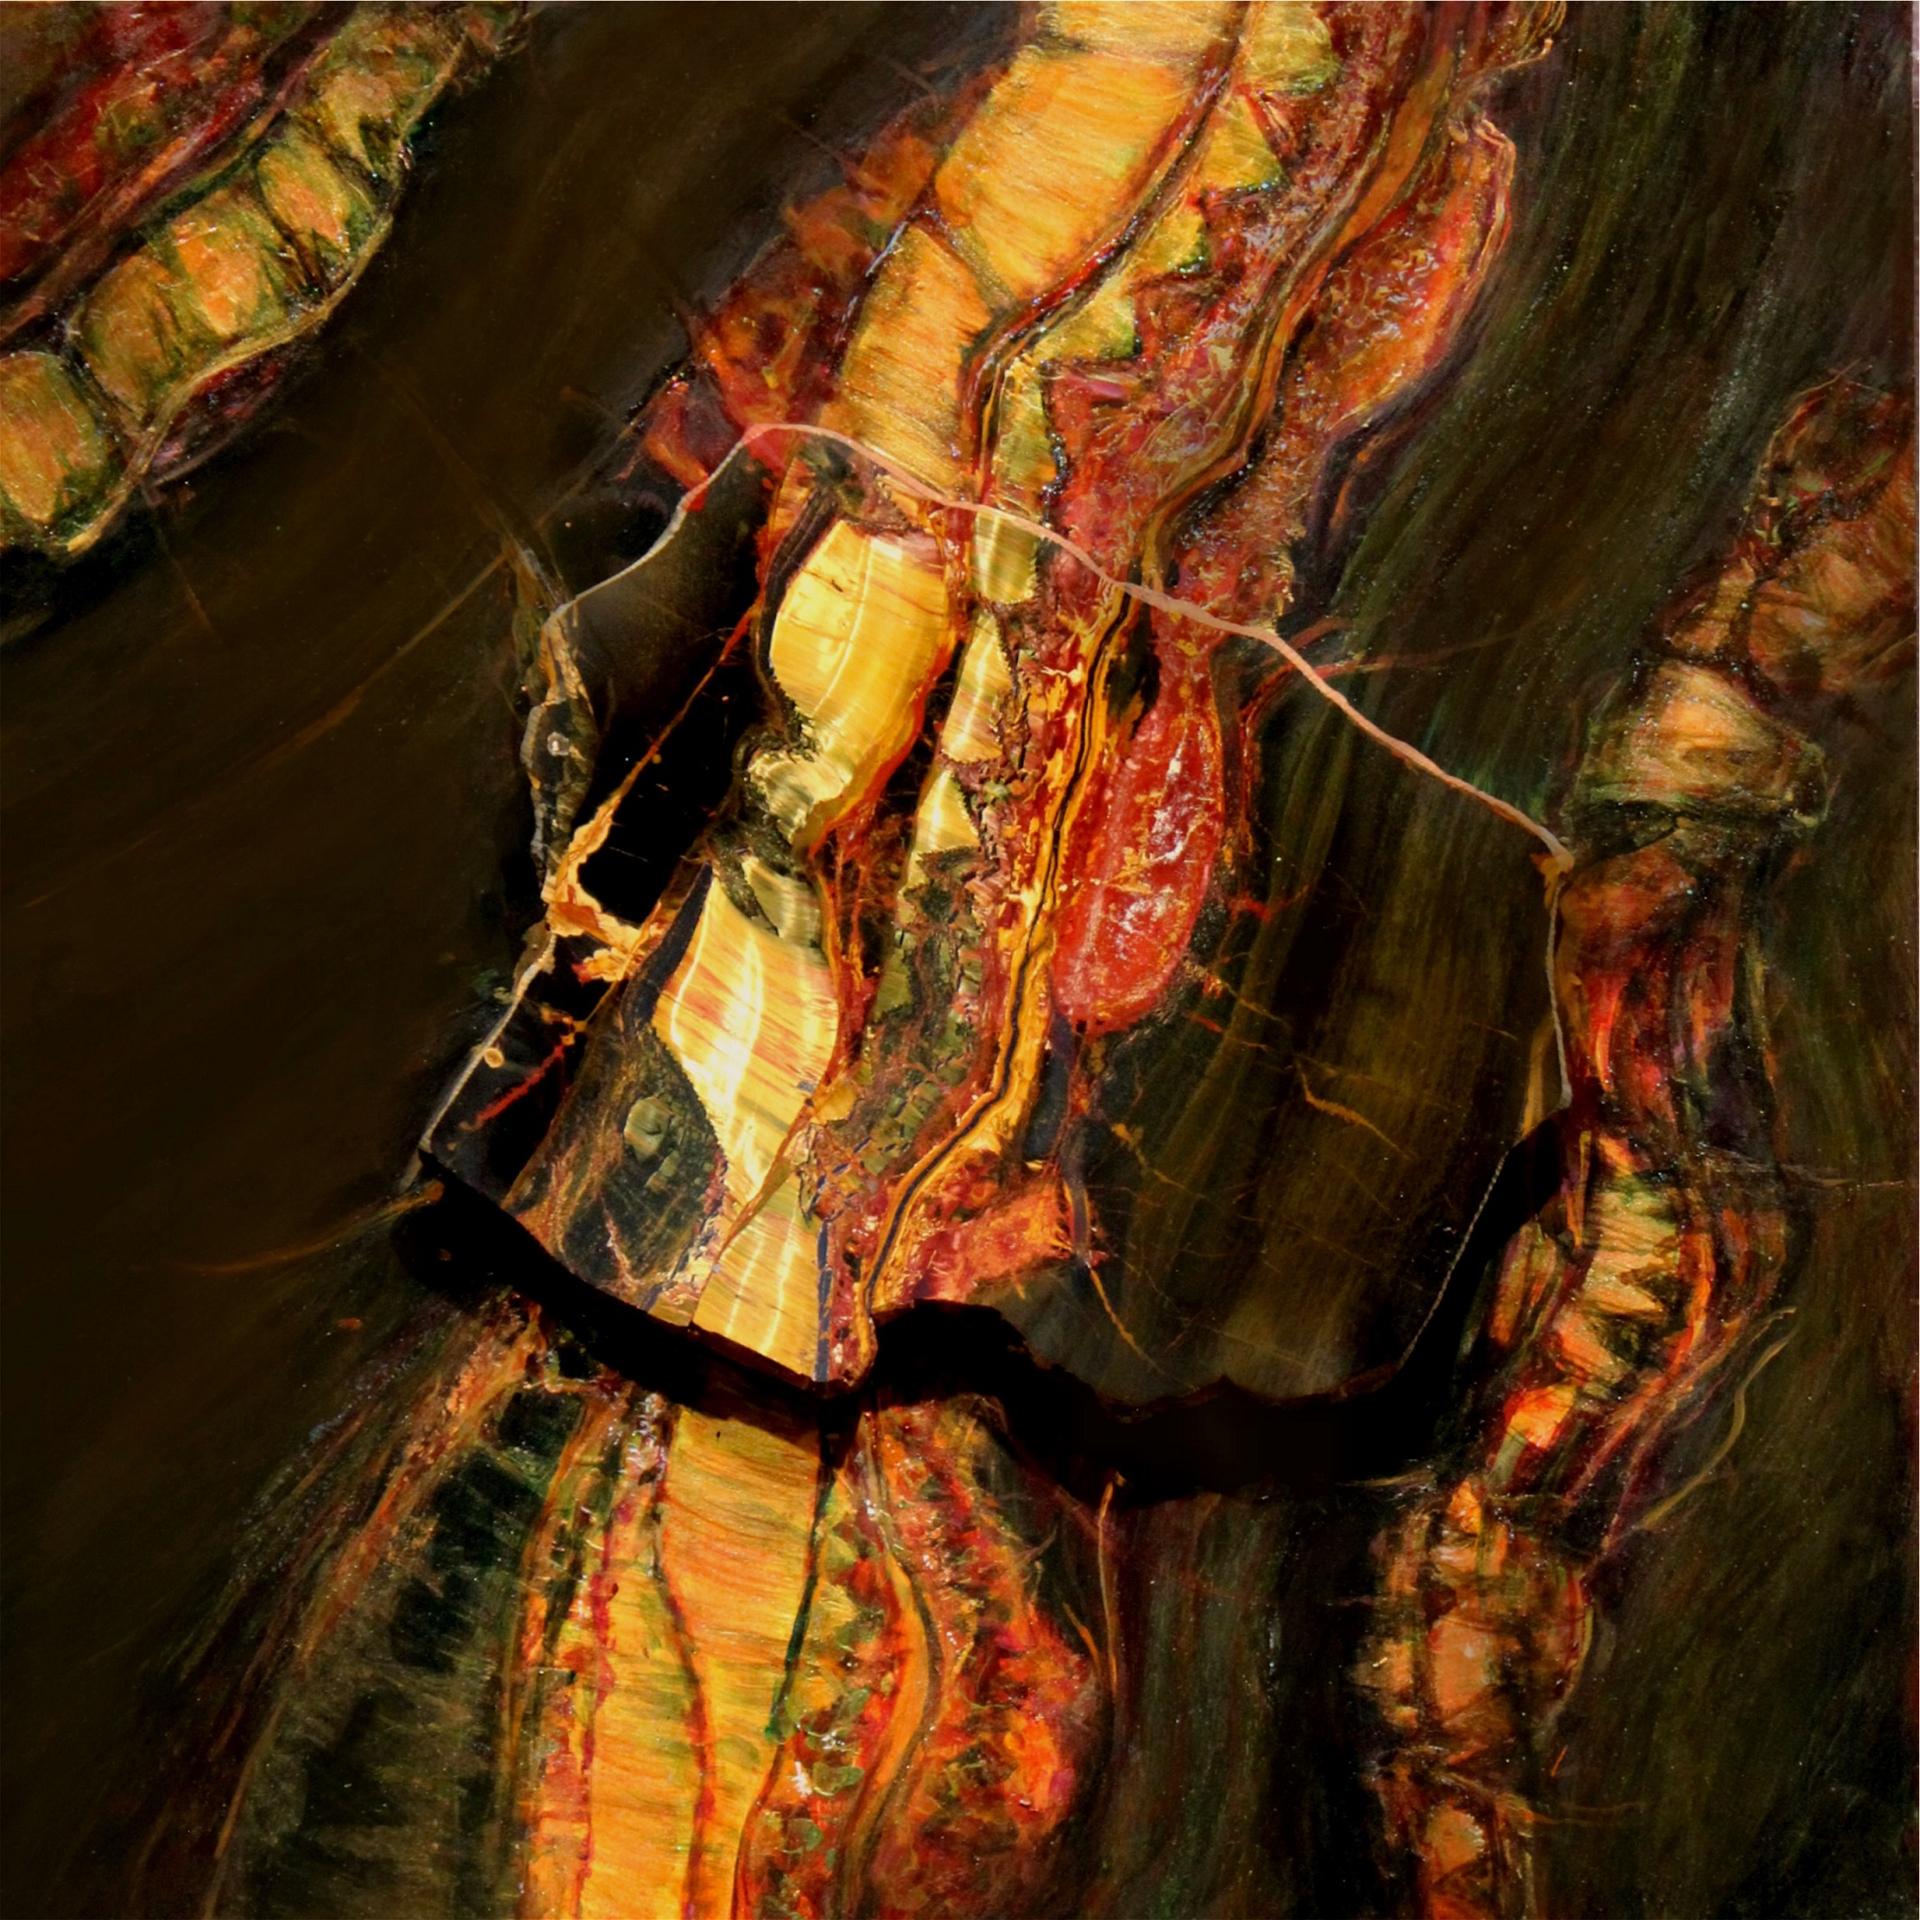 Eye of the Tiger (Marramamba) by Redhawk Mallet